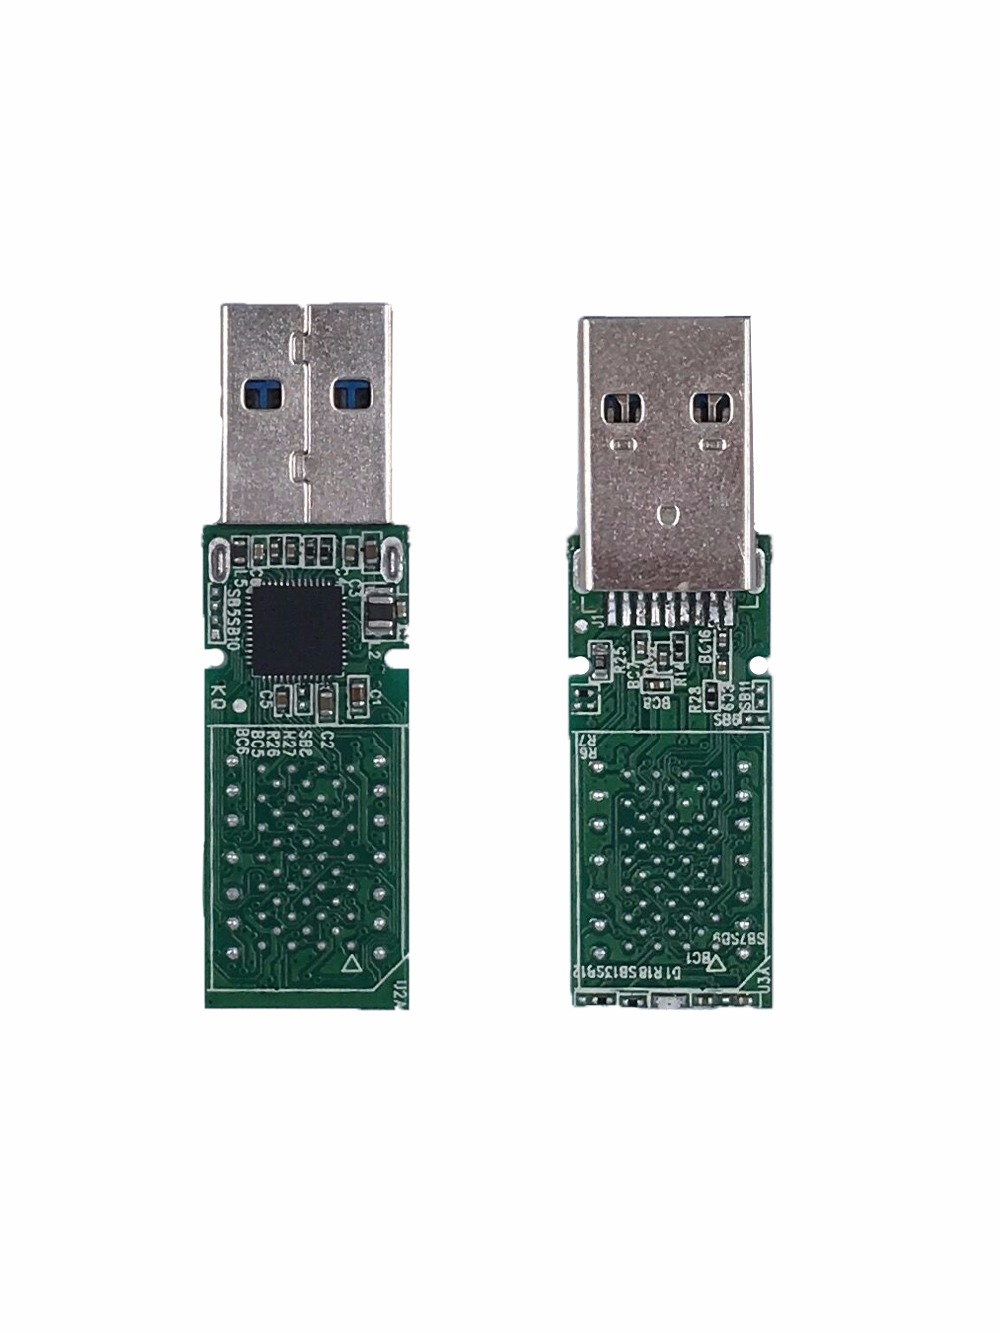 Cbm2099e Ufd Pcba Usb Flash Drive Pcbausb20 Pendrive Cbm2099 Ic Best Price Circuit Board Buy For Iphone Nand Socket Lga60 Sm3267 30 Pcb U Disk Free Crystal With Lga